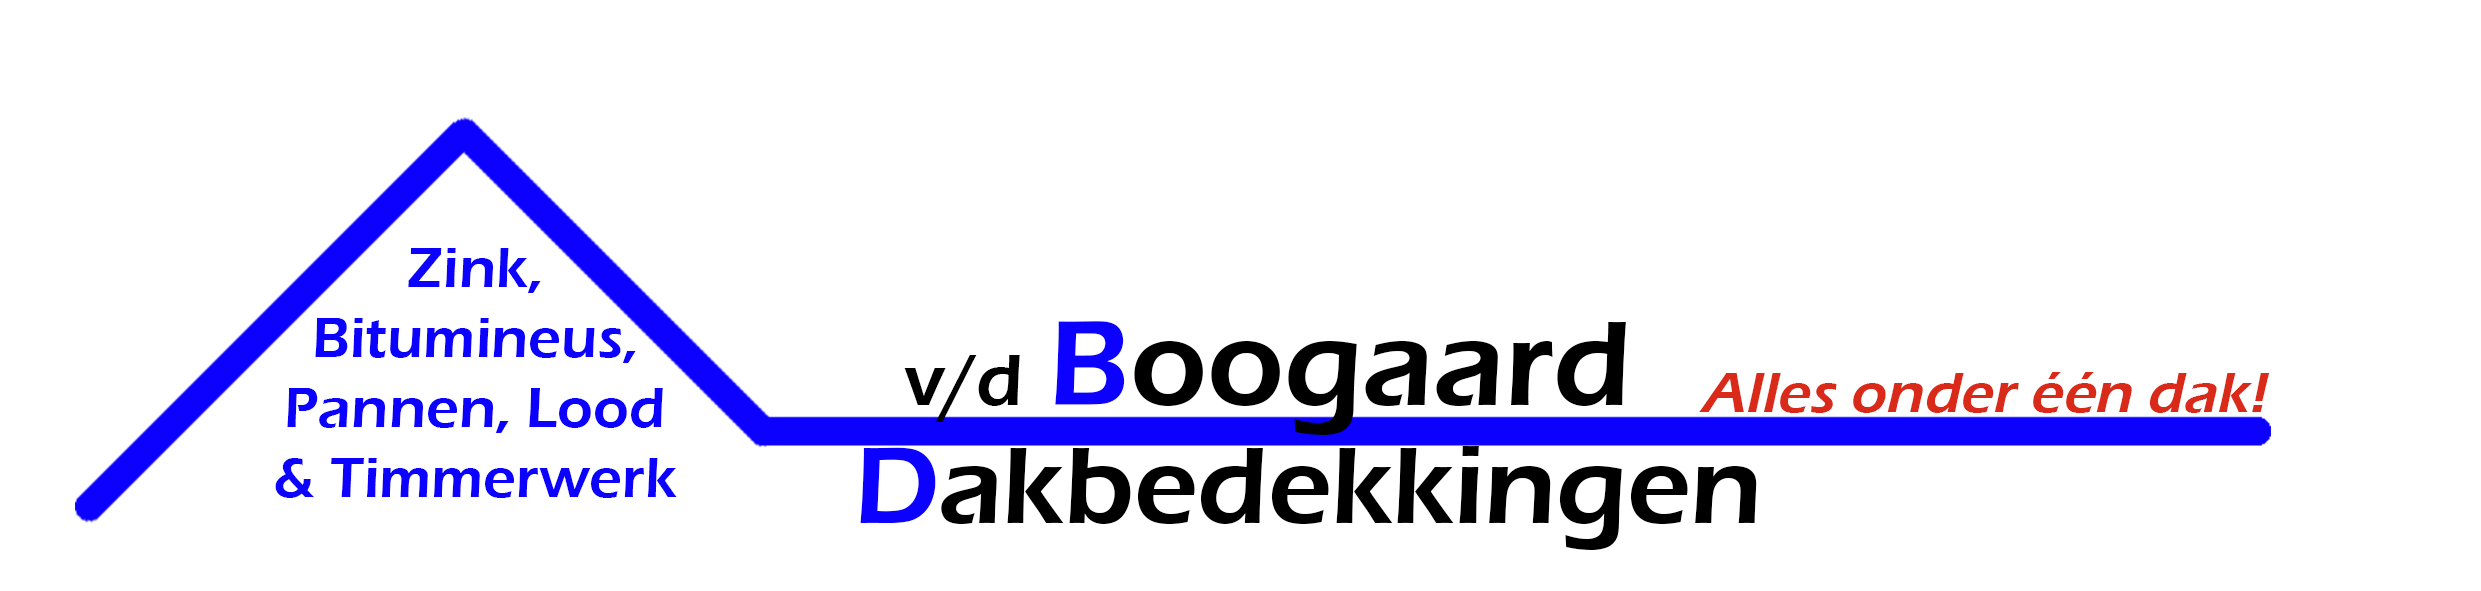 v/d Boogaard Dakbedekkingen